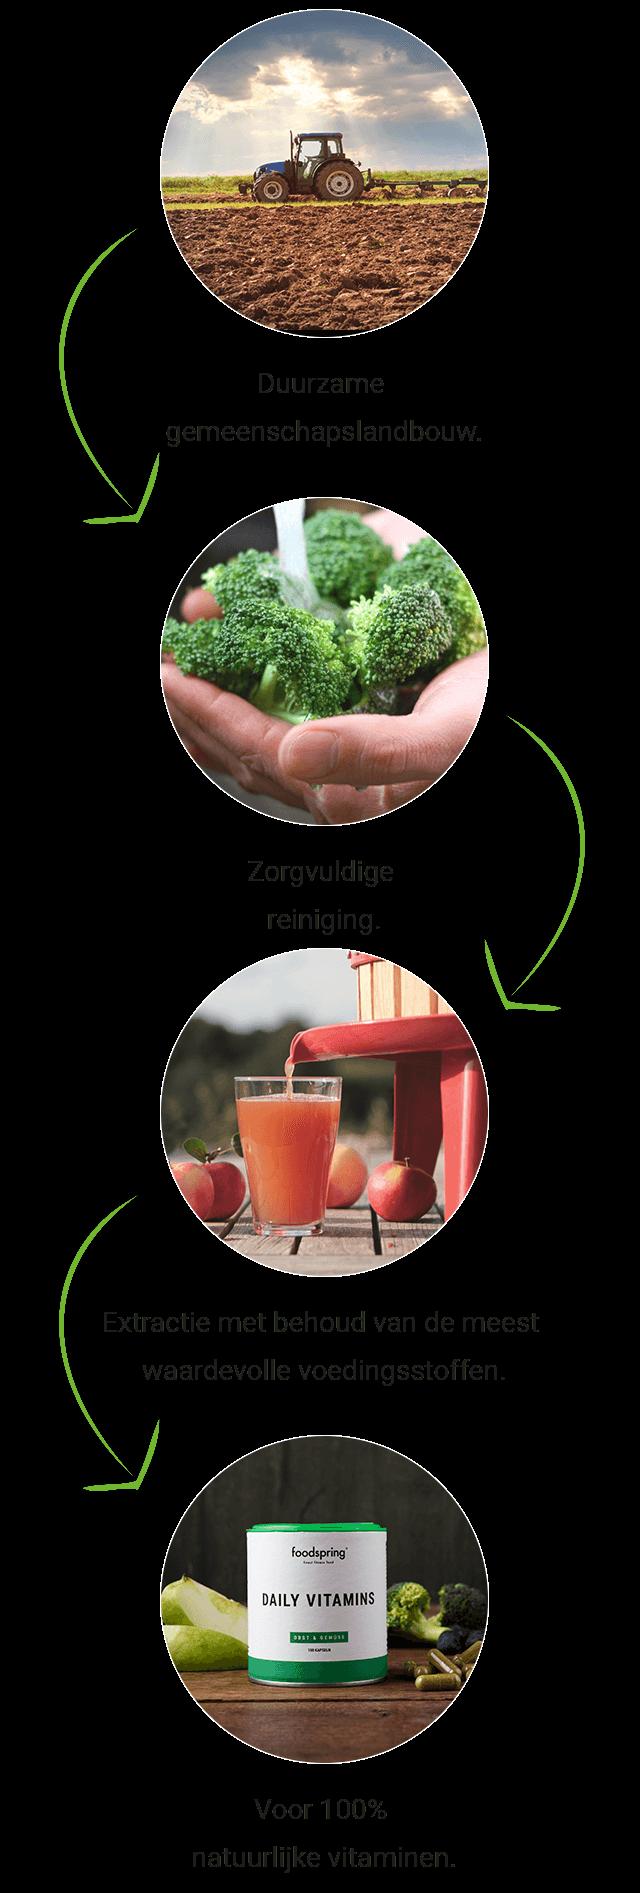 Productieproces van de Daily Vitamins capsules